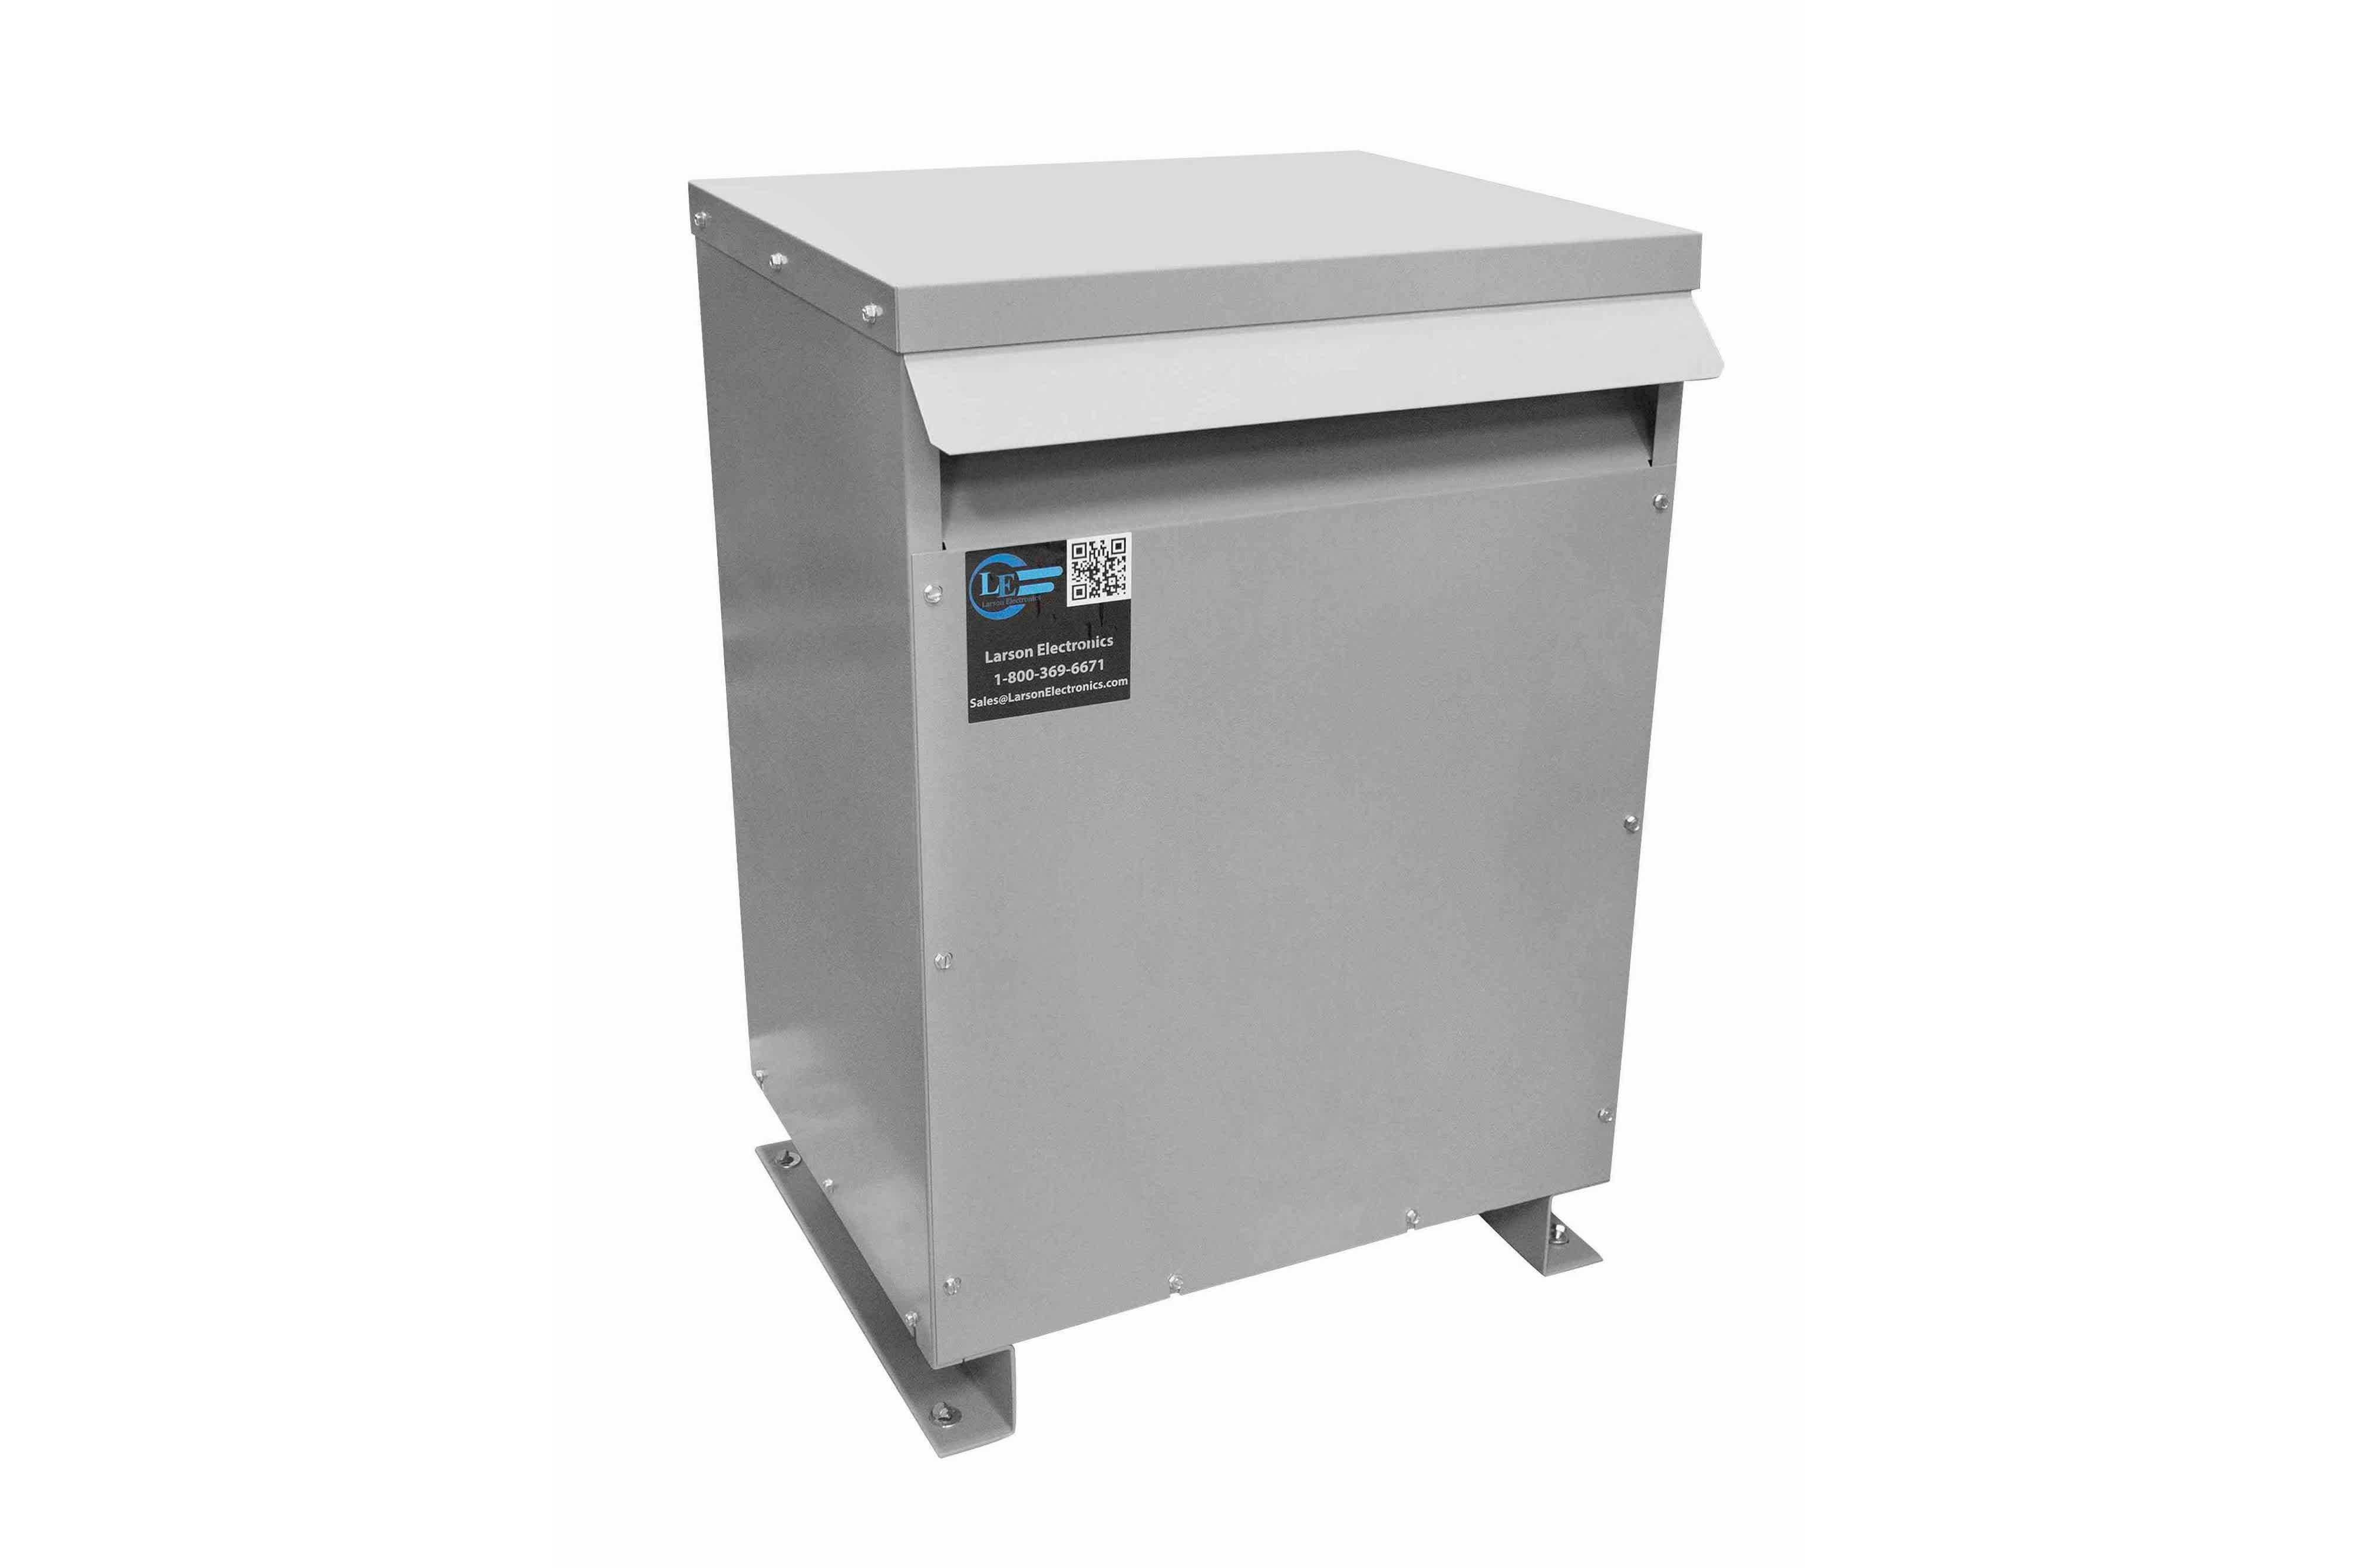 100 kVA 3PH Isolation Transformer, 380V Wye Primary, 208V Delta Secondary, N3R, Ventilated, 60 Hz